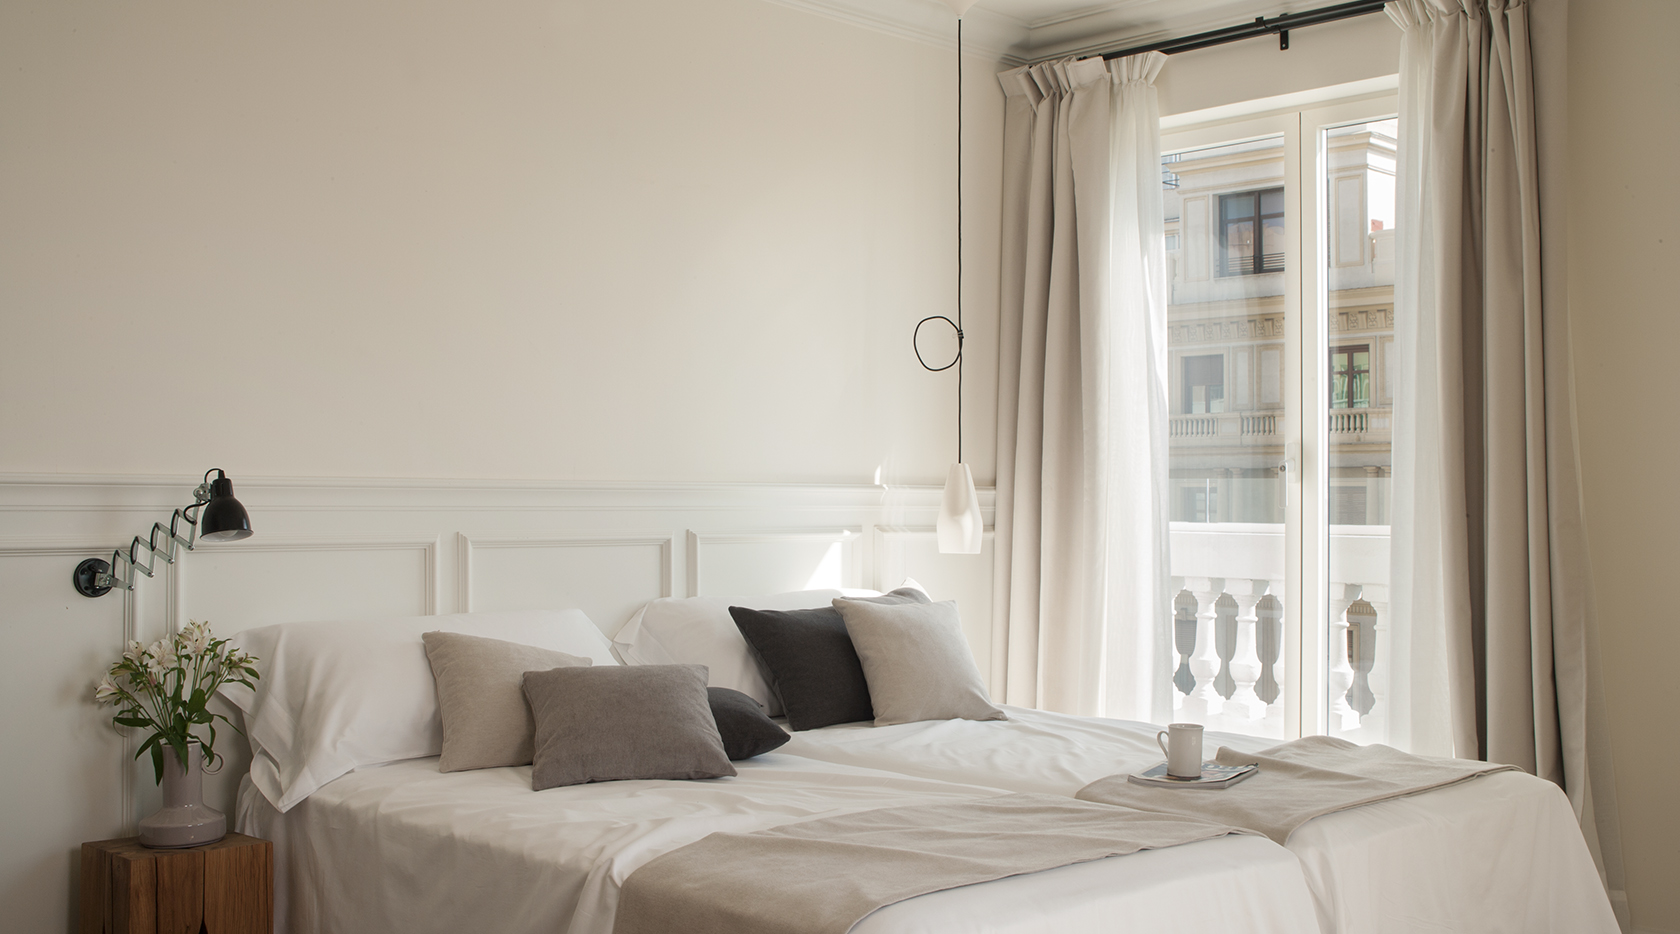 Hotel Madrid familienzimmer - Dear Hotel,